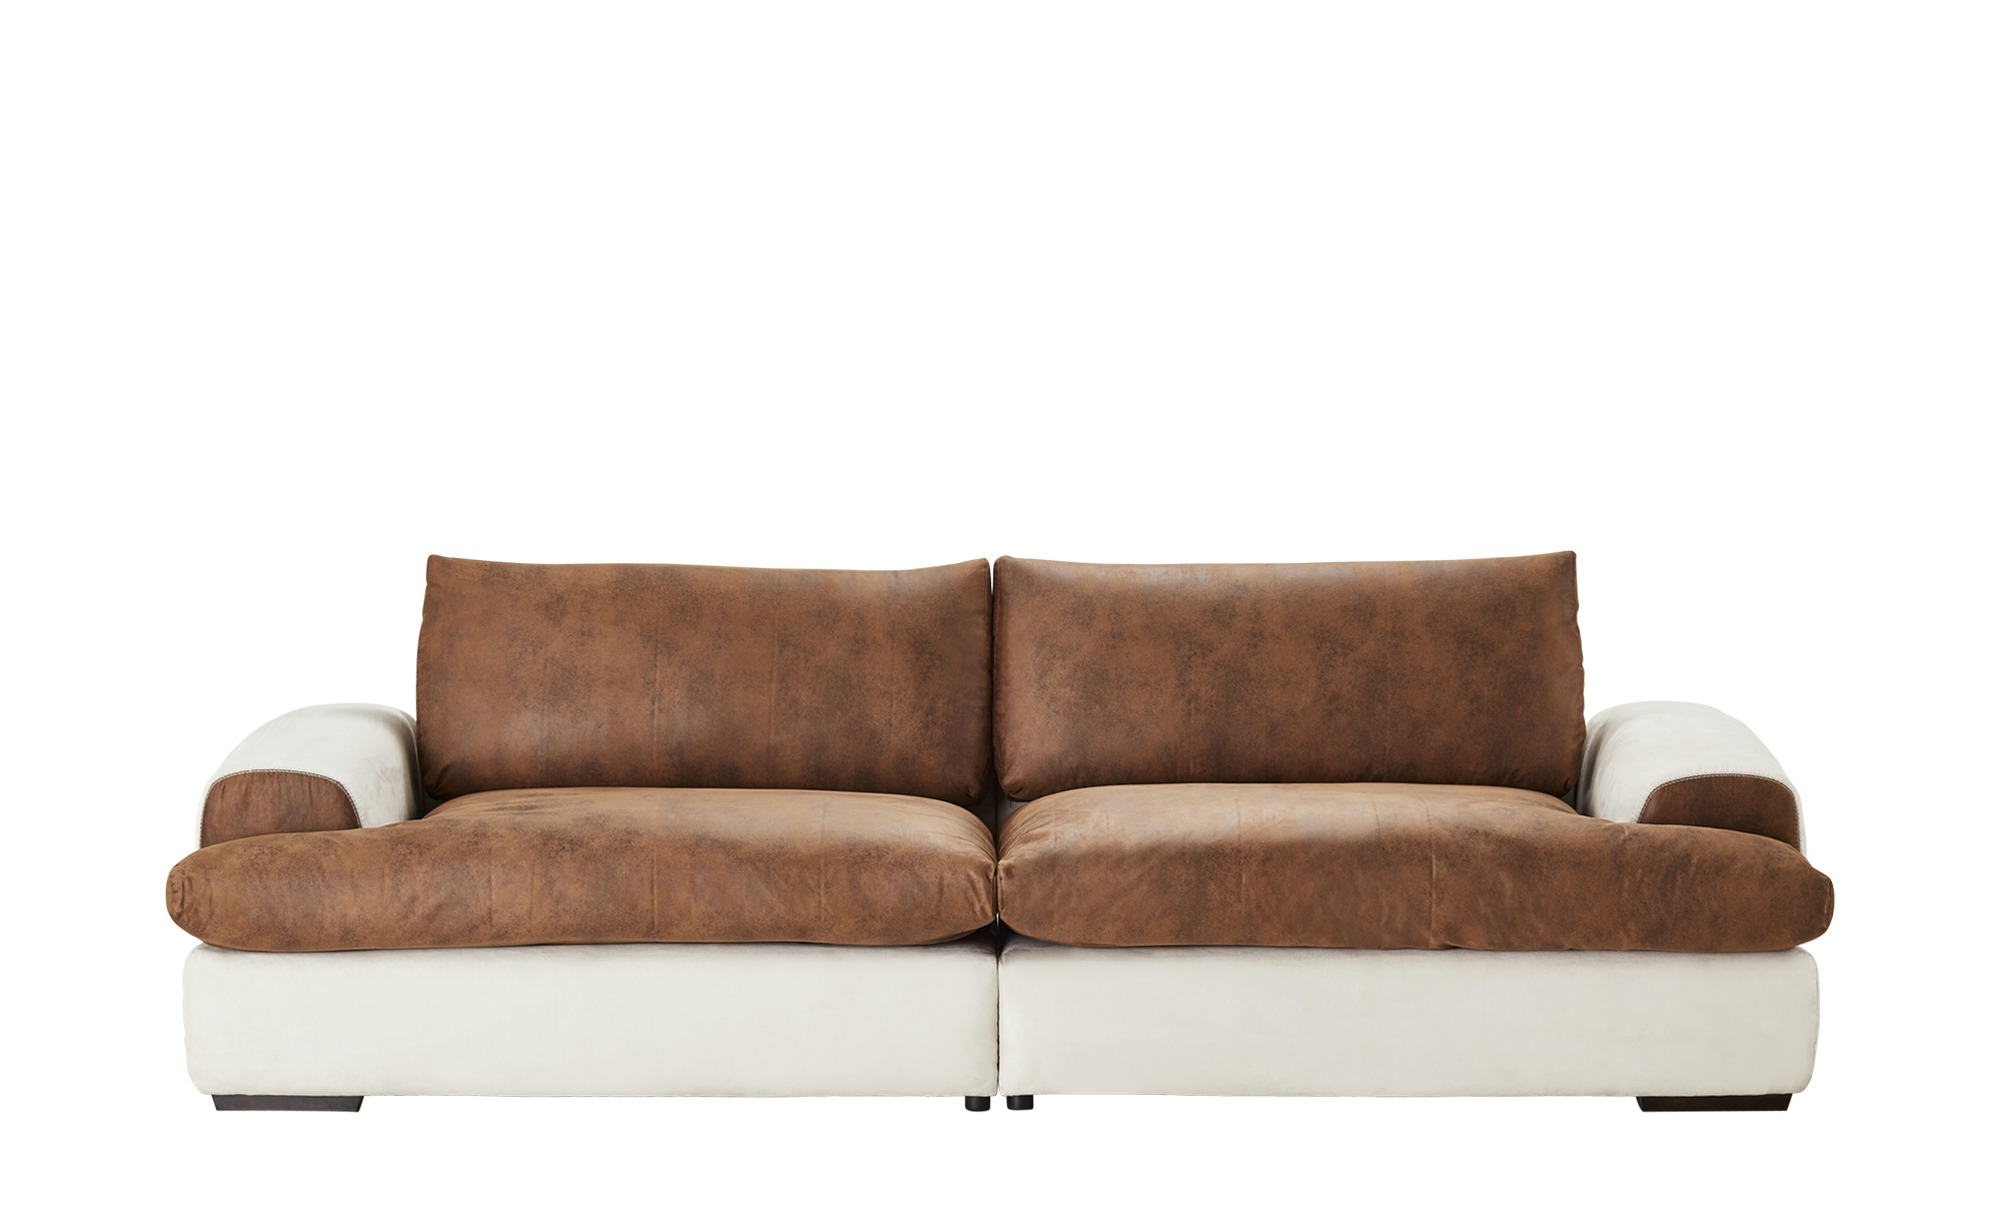 Big Sofa weiß/braun - Flachgewebe/Mikrofaser Gracie ¦ braun ¦ Maße (cm): B: 280 H: 85 T: 108 Polstermöbel > Sofas > Big-Sofas - Höffner